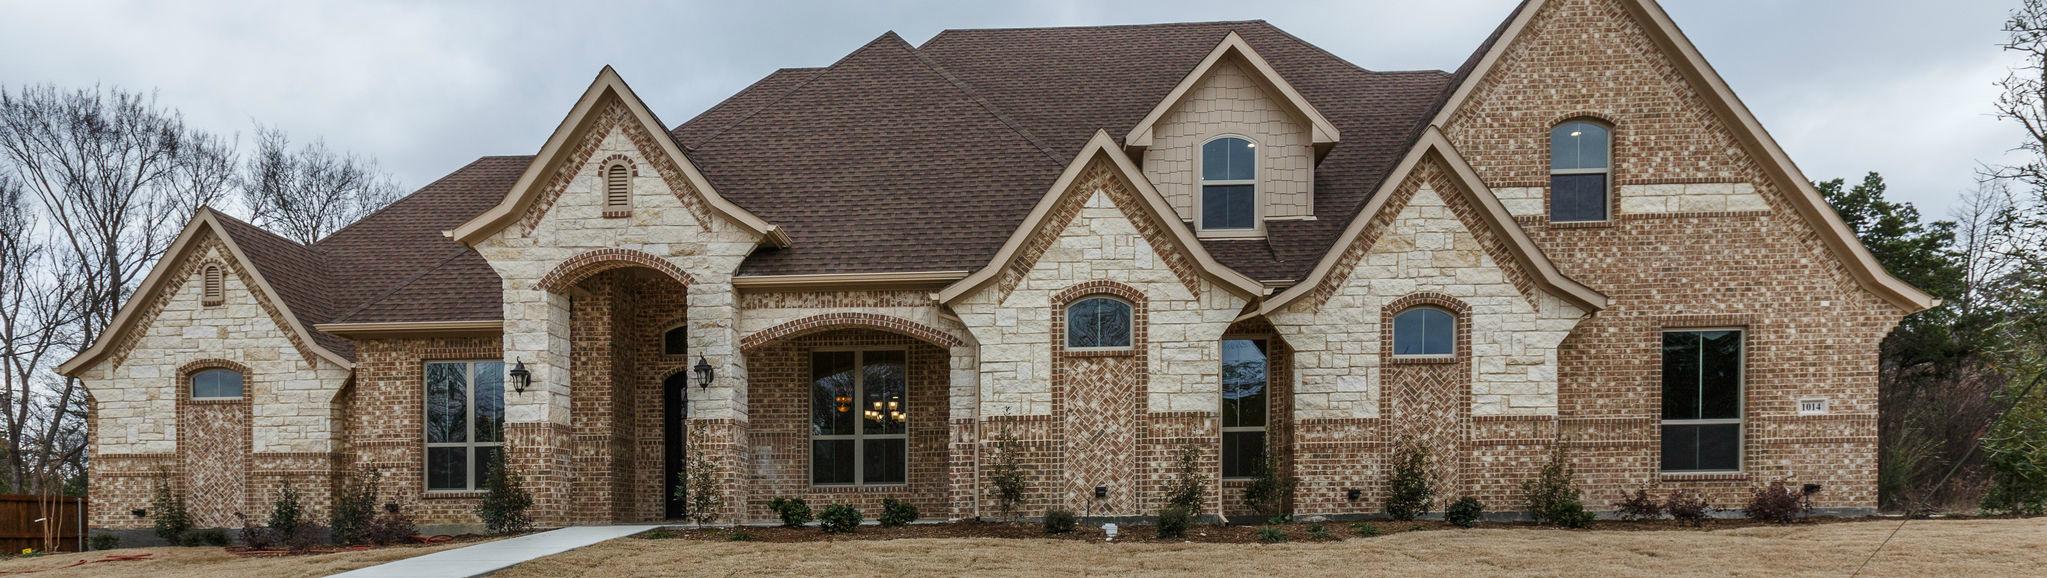 Brickman Homes & Construction